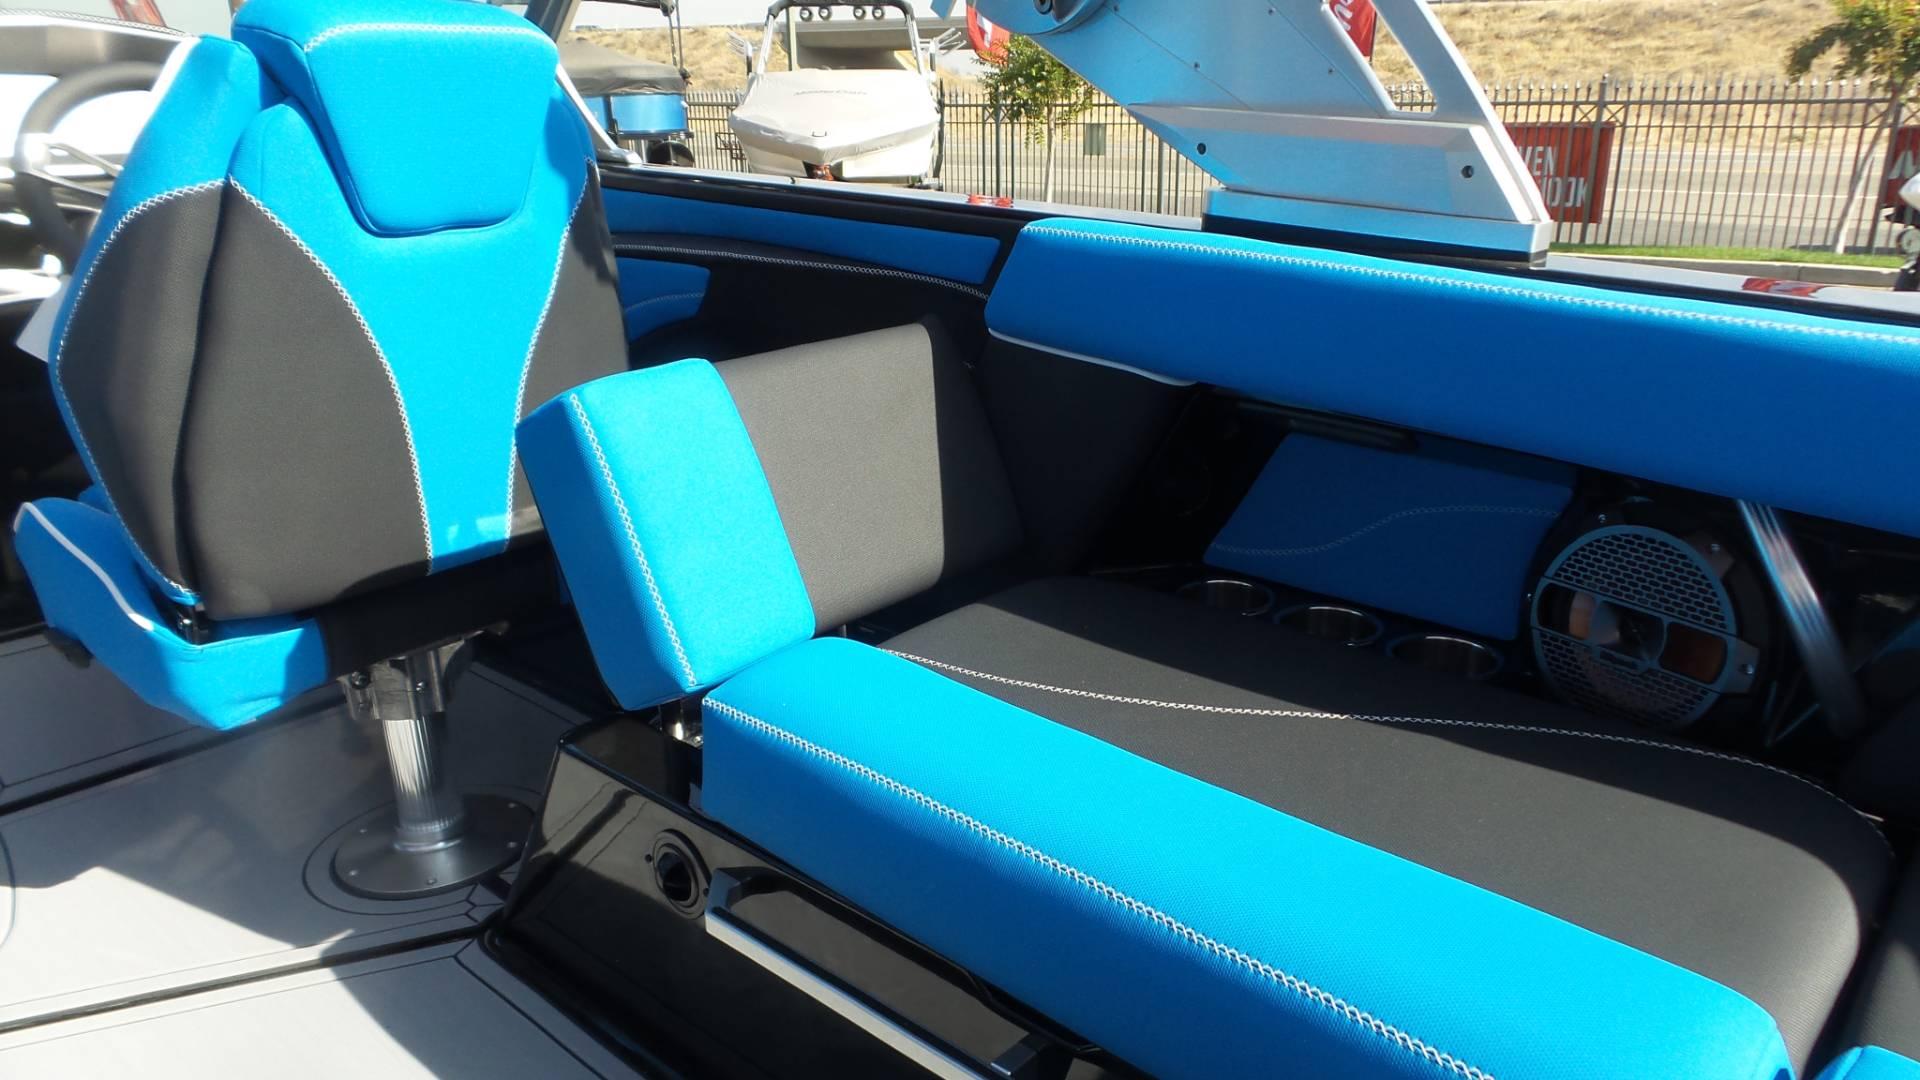 2019 Mastercraft XT22 Jet Stream Blue & Black Power Boats